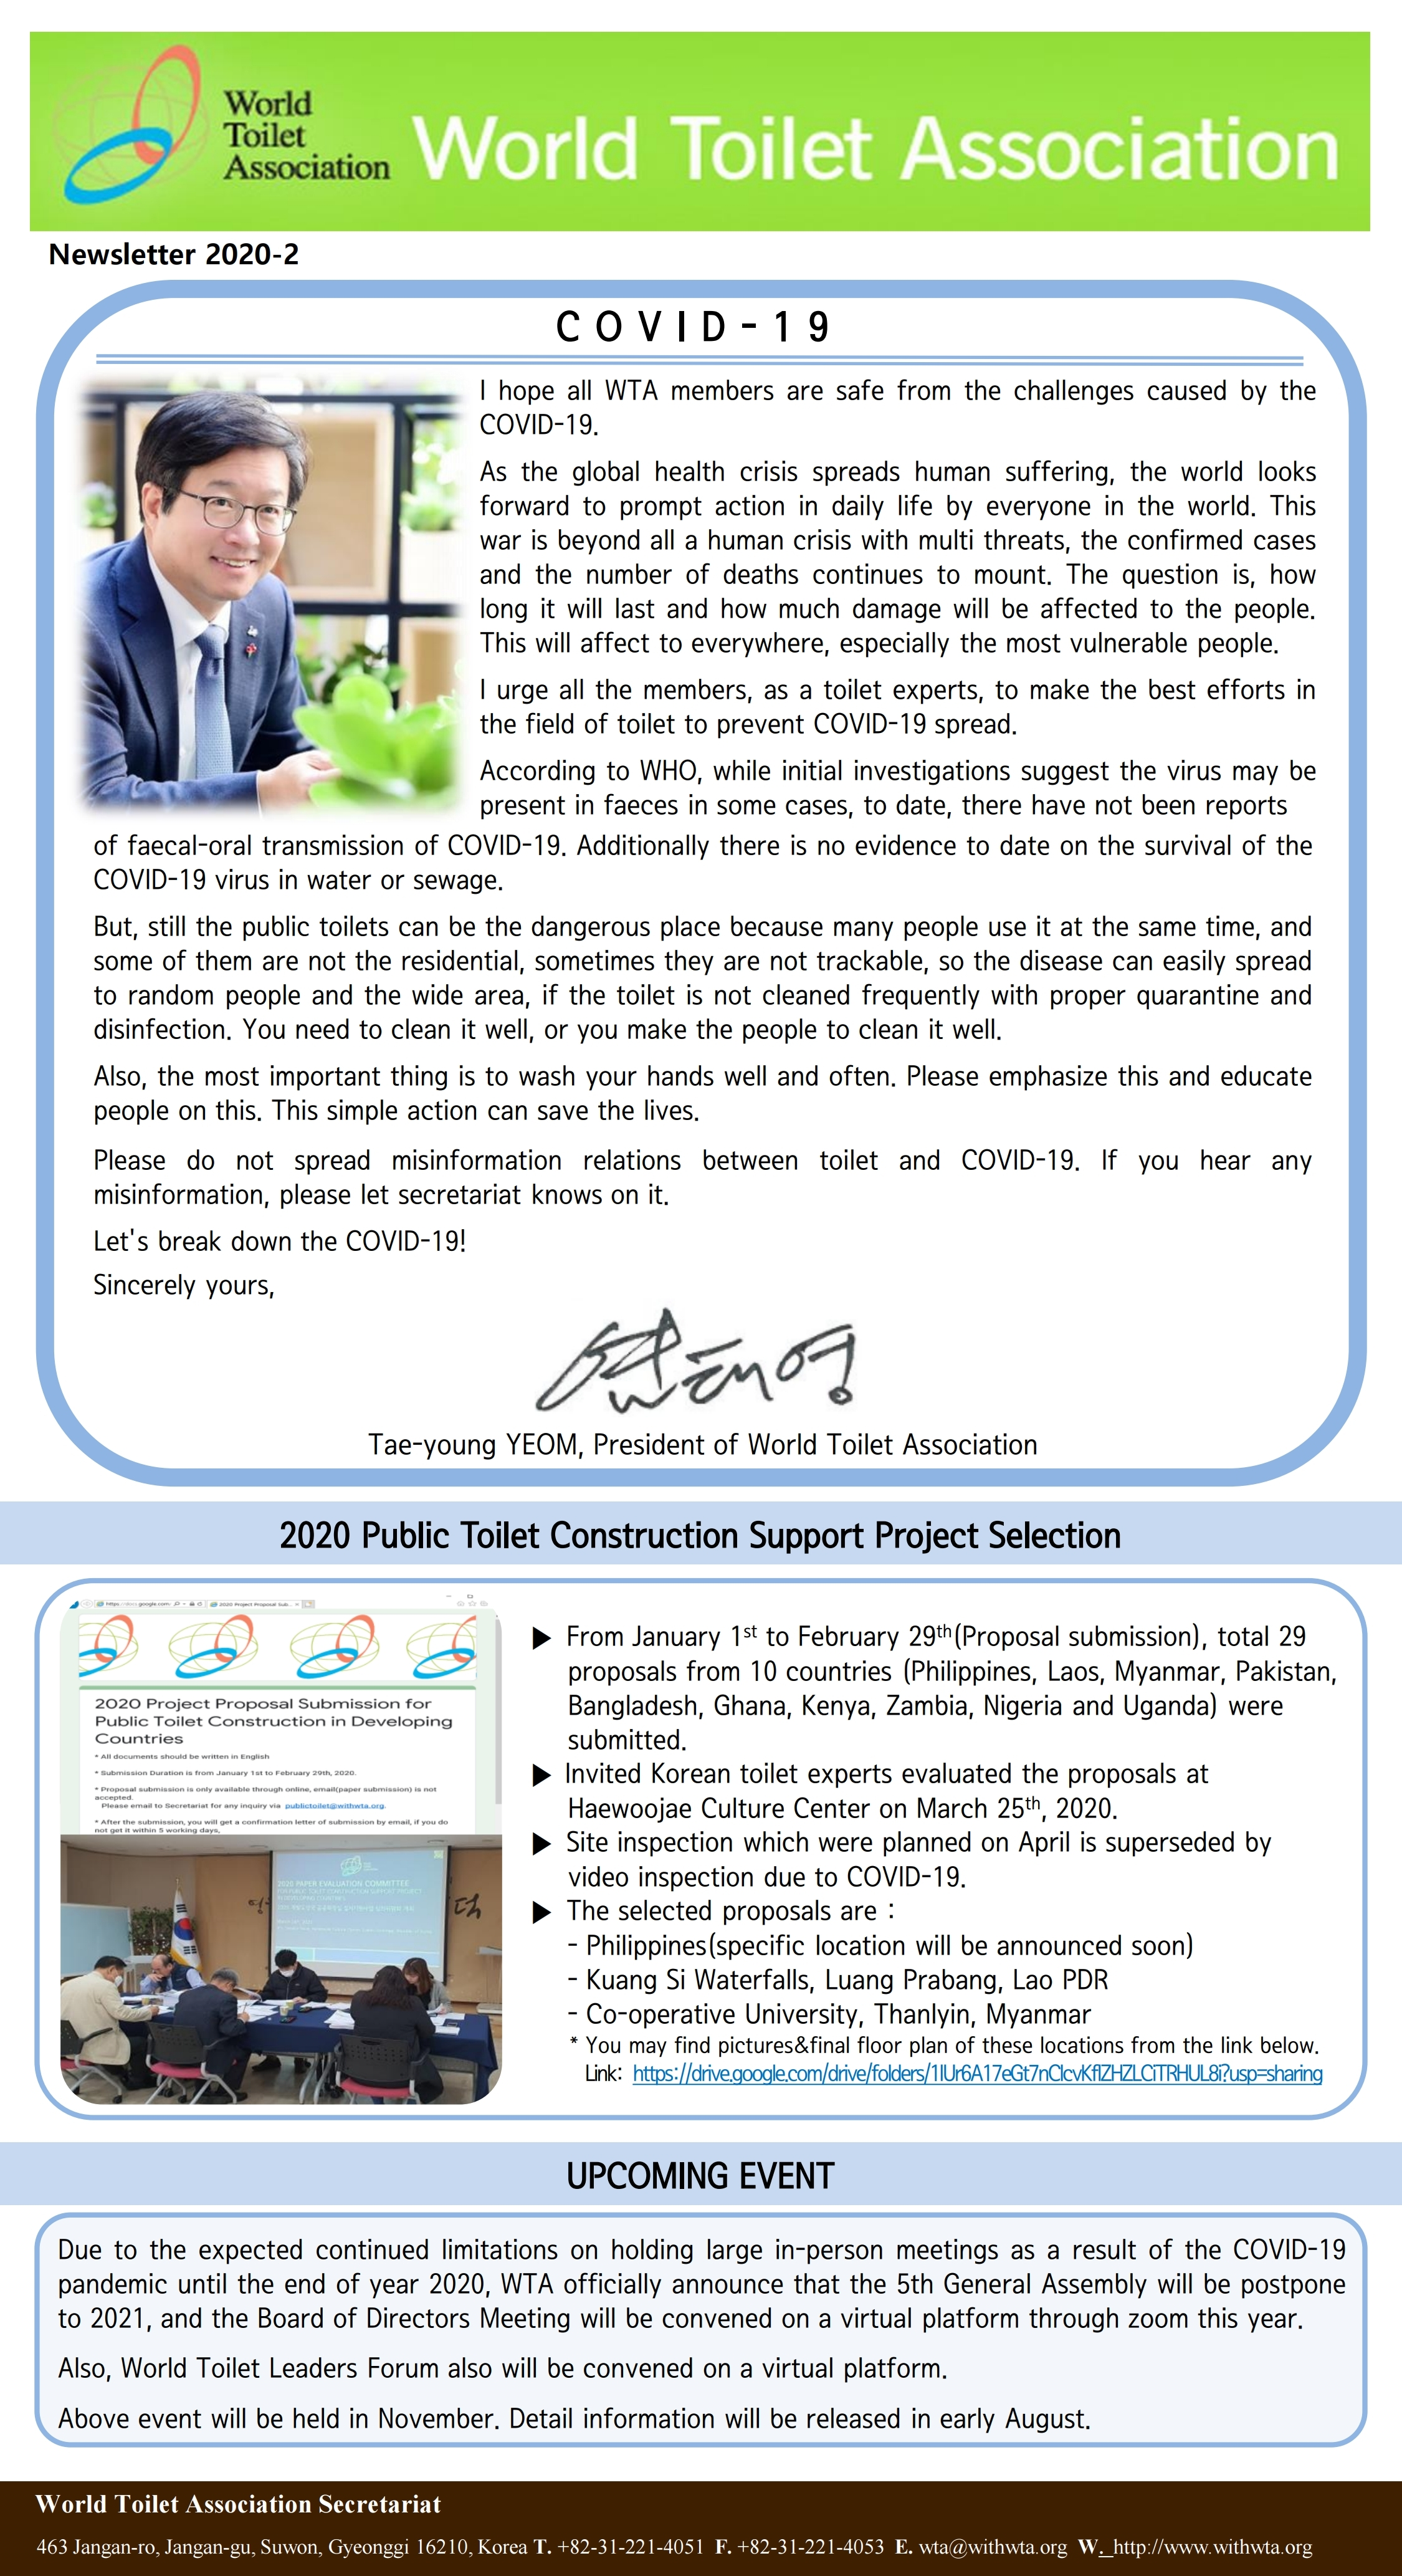 Newsletter 2020-2(Final).pdf_page_2.jpg